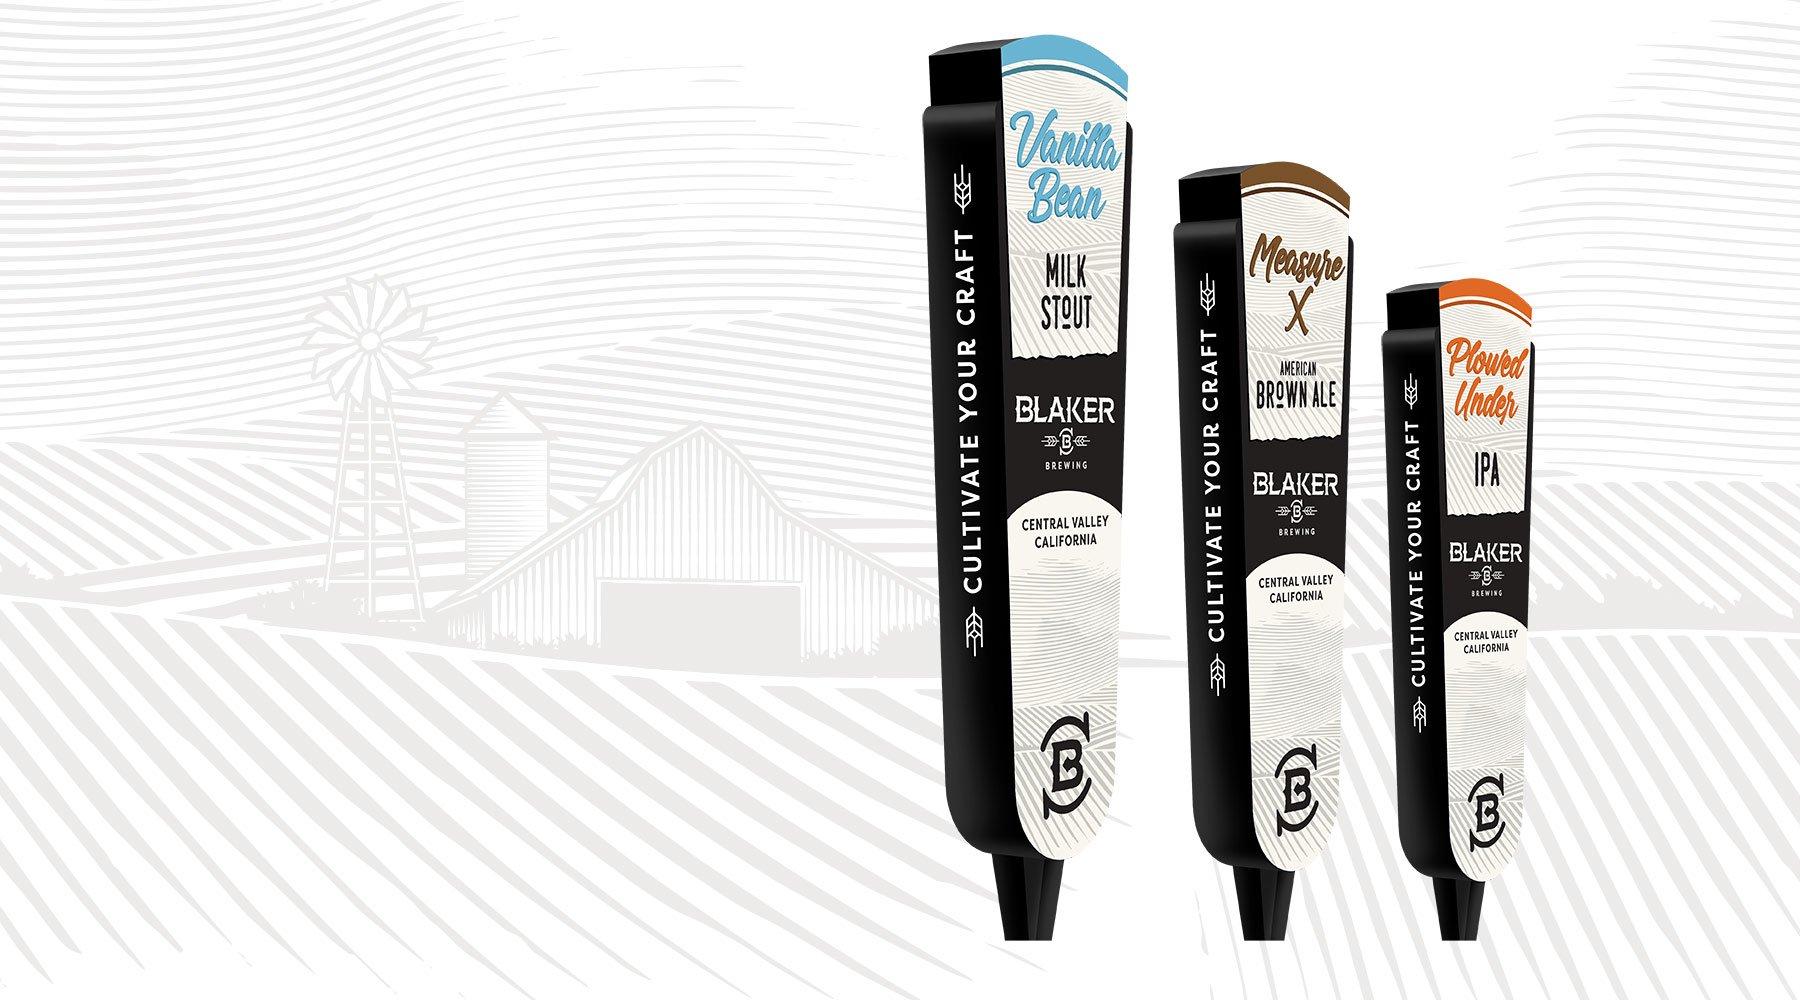 Blaker Brewing Tap Handles